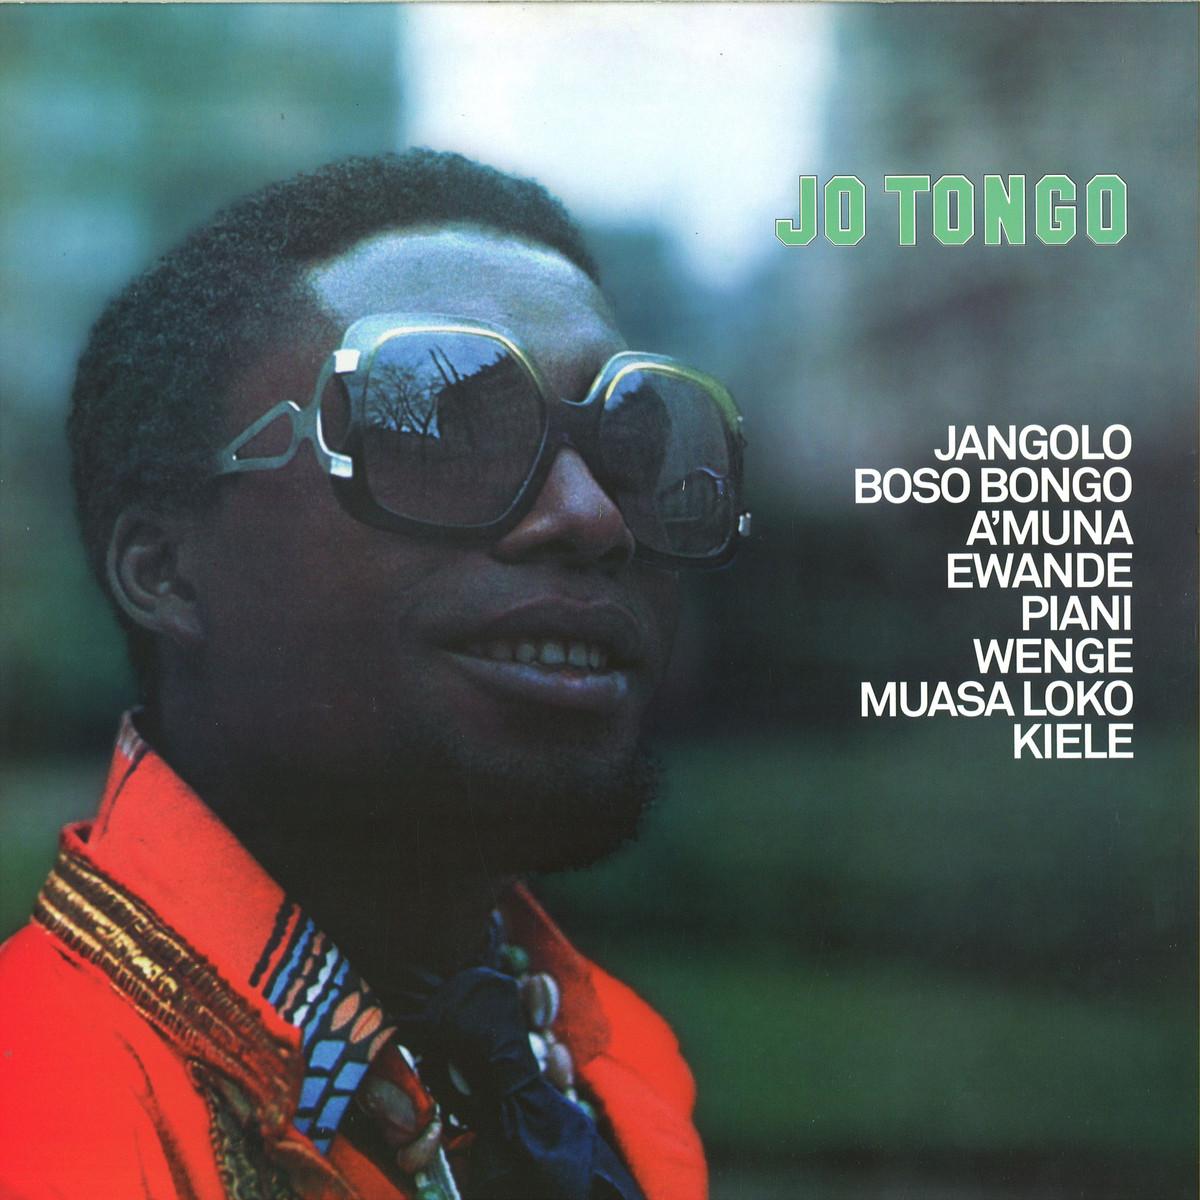 Jo Tongo - Jangolo